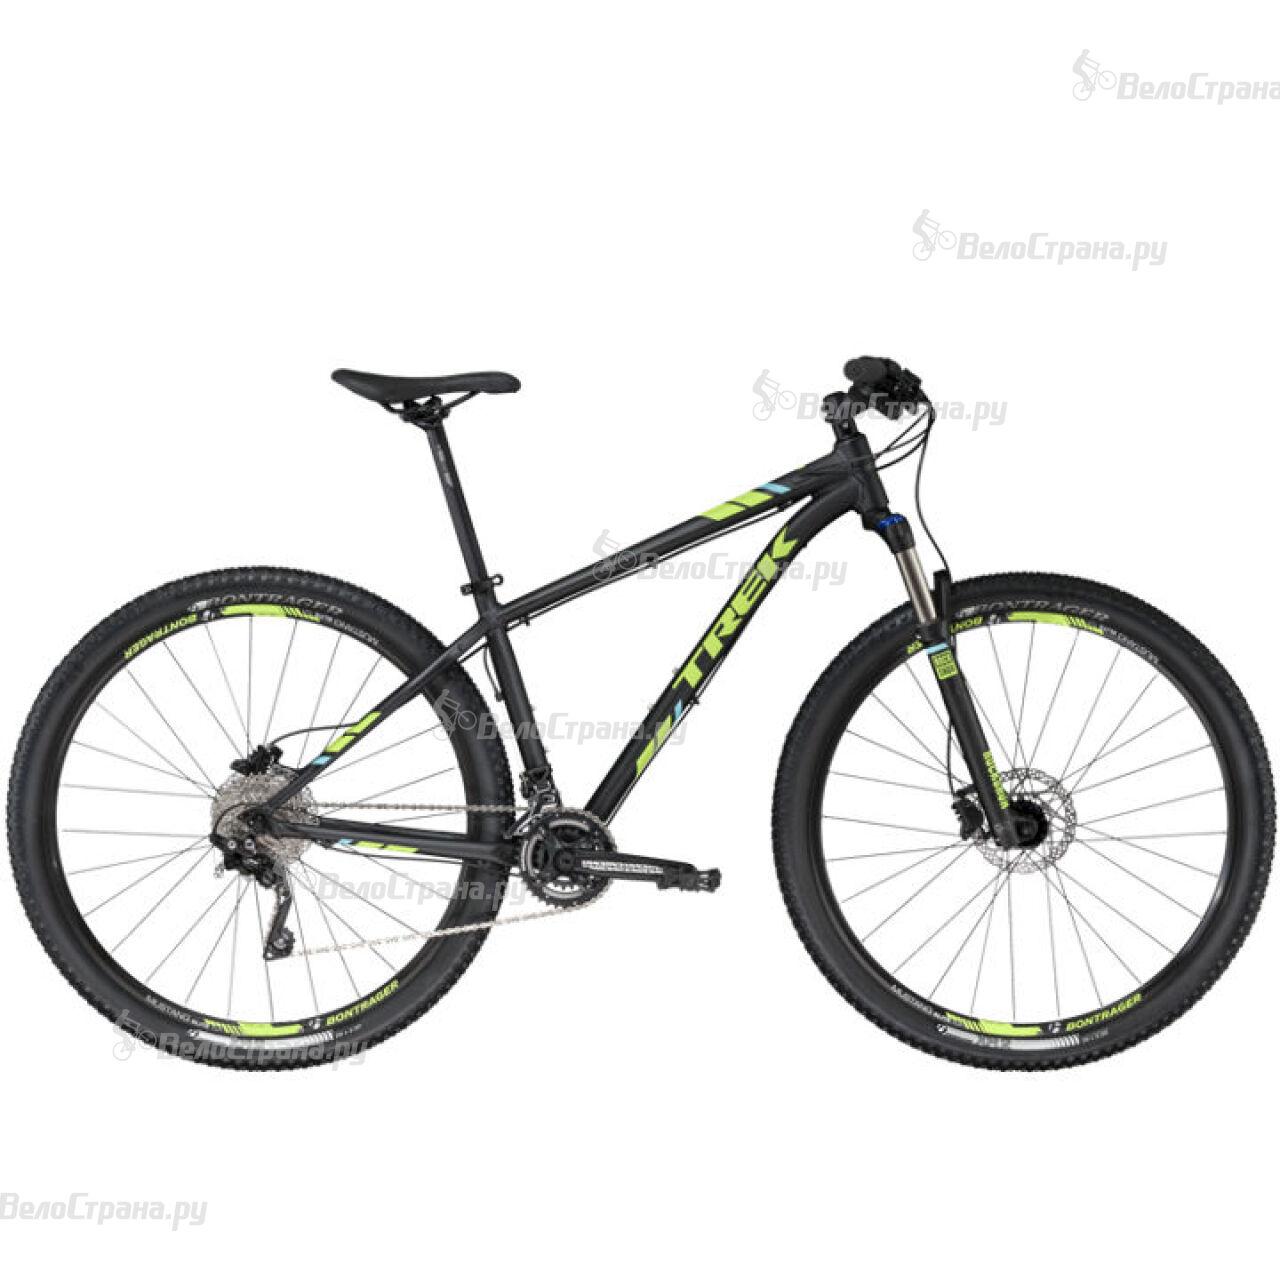 Велосипед Trek X-Caliber 9 (2017) велосипед trek fuel ex 9 29 2017